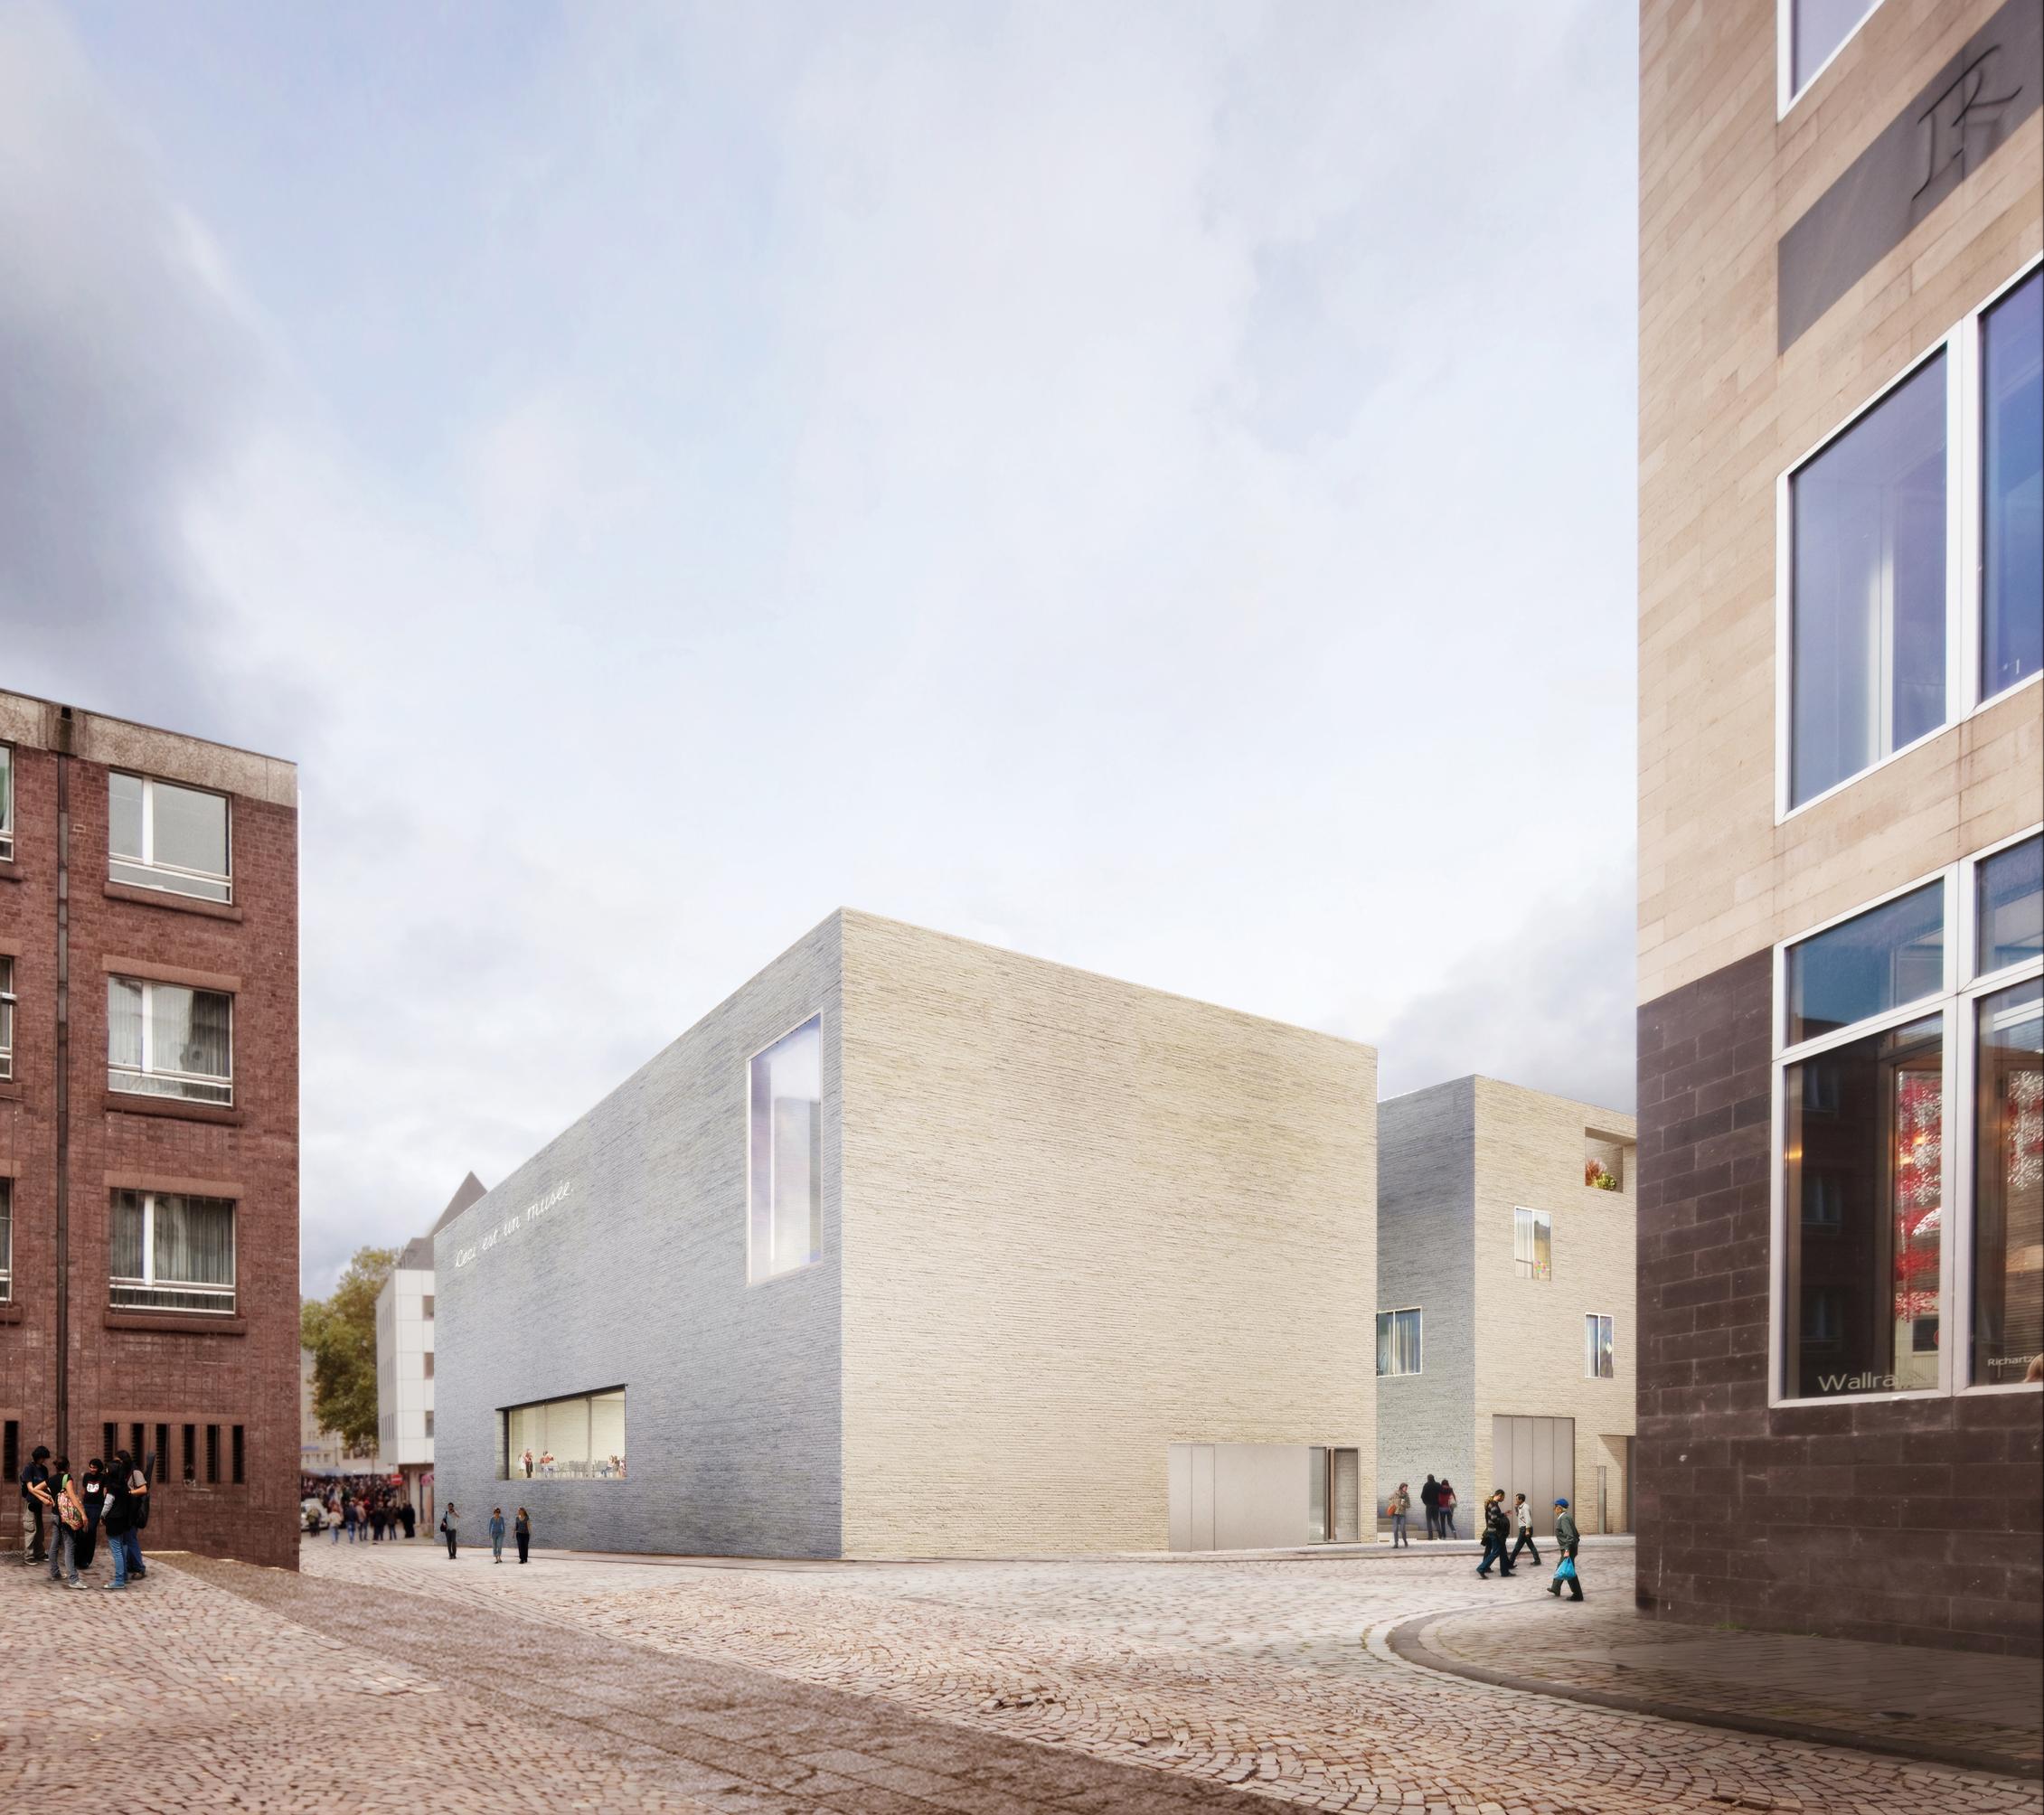 erweiterung des wallraf richartz museums fondation corboud stadt k ln. Black Bedroom Furniture Sets. Home Design Ideas